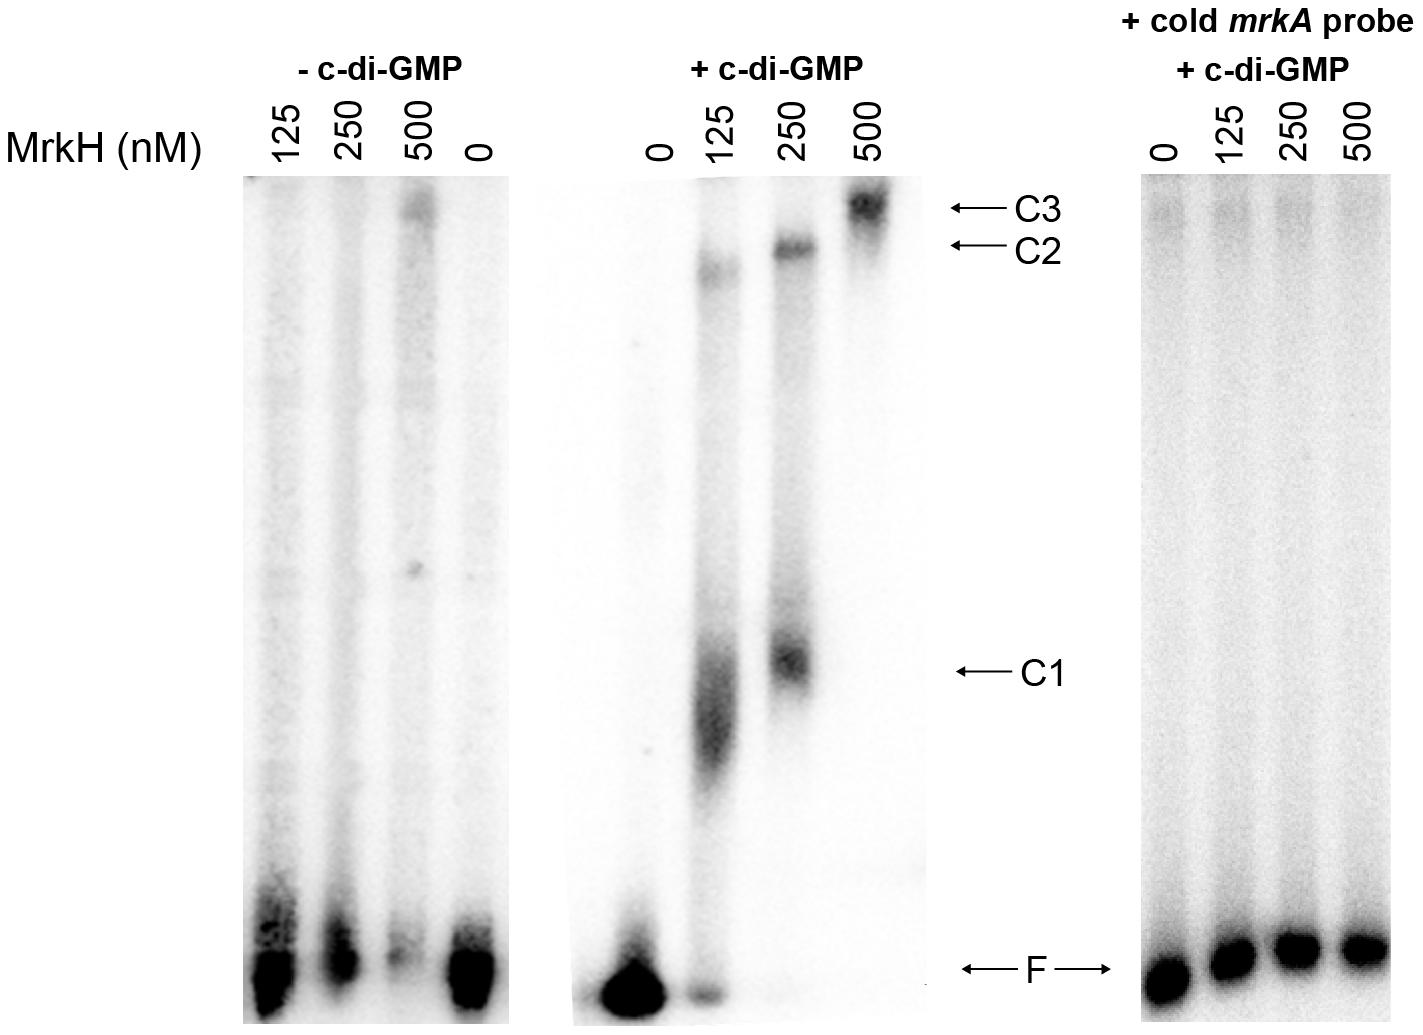 Analysis of the binding of MrkH-8×His to the <i>mrkA</i> regulatory region by EMSA.